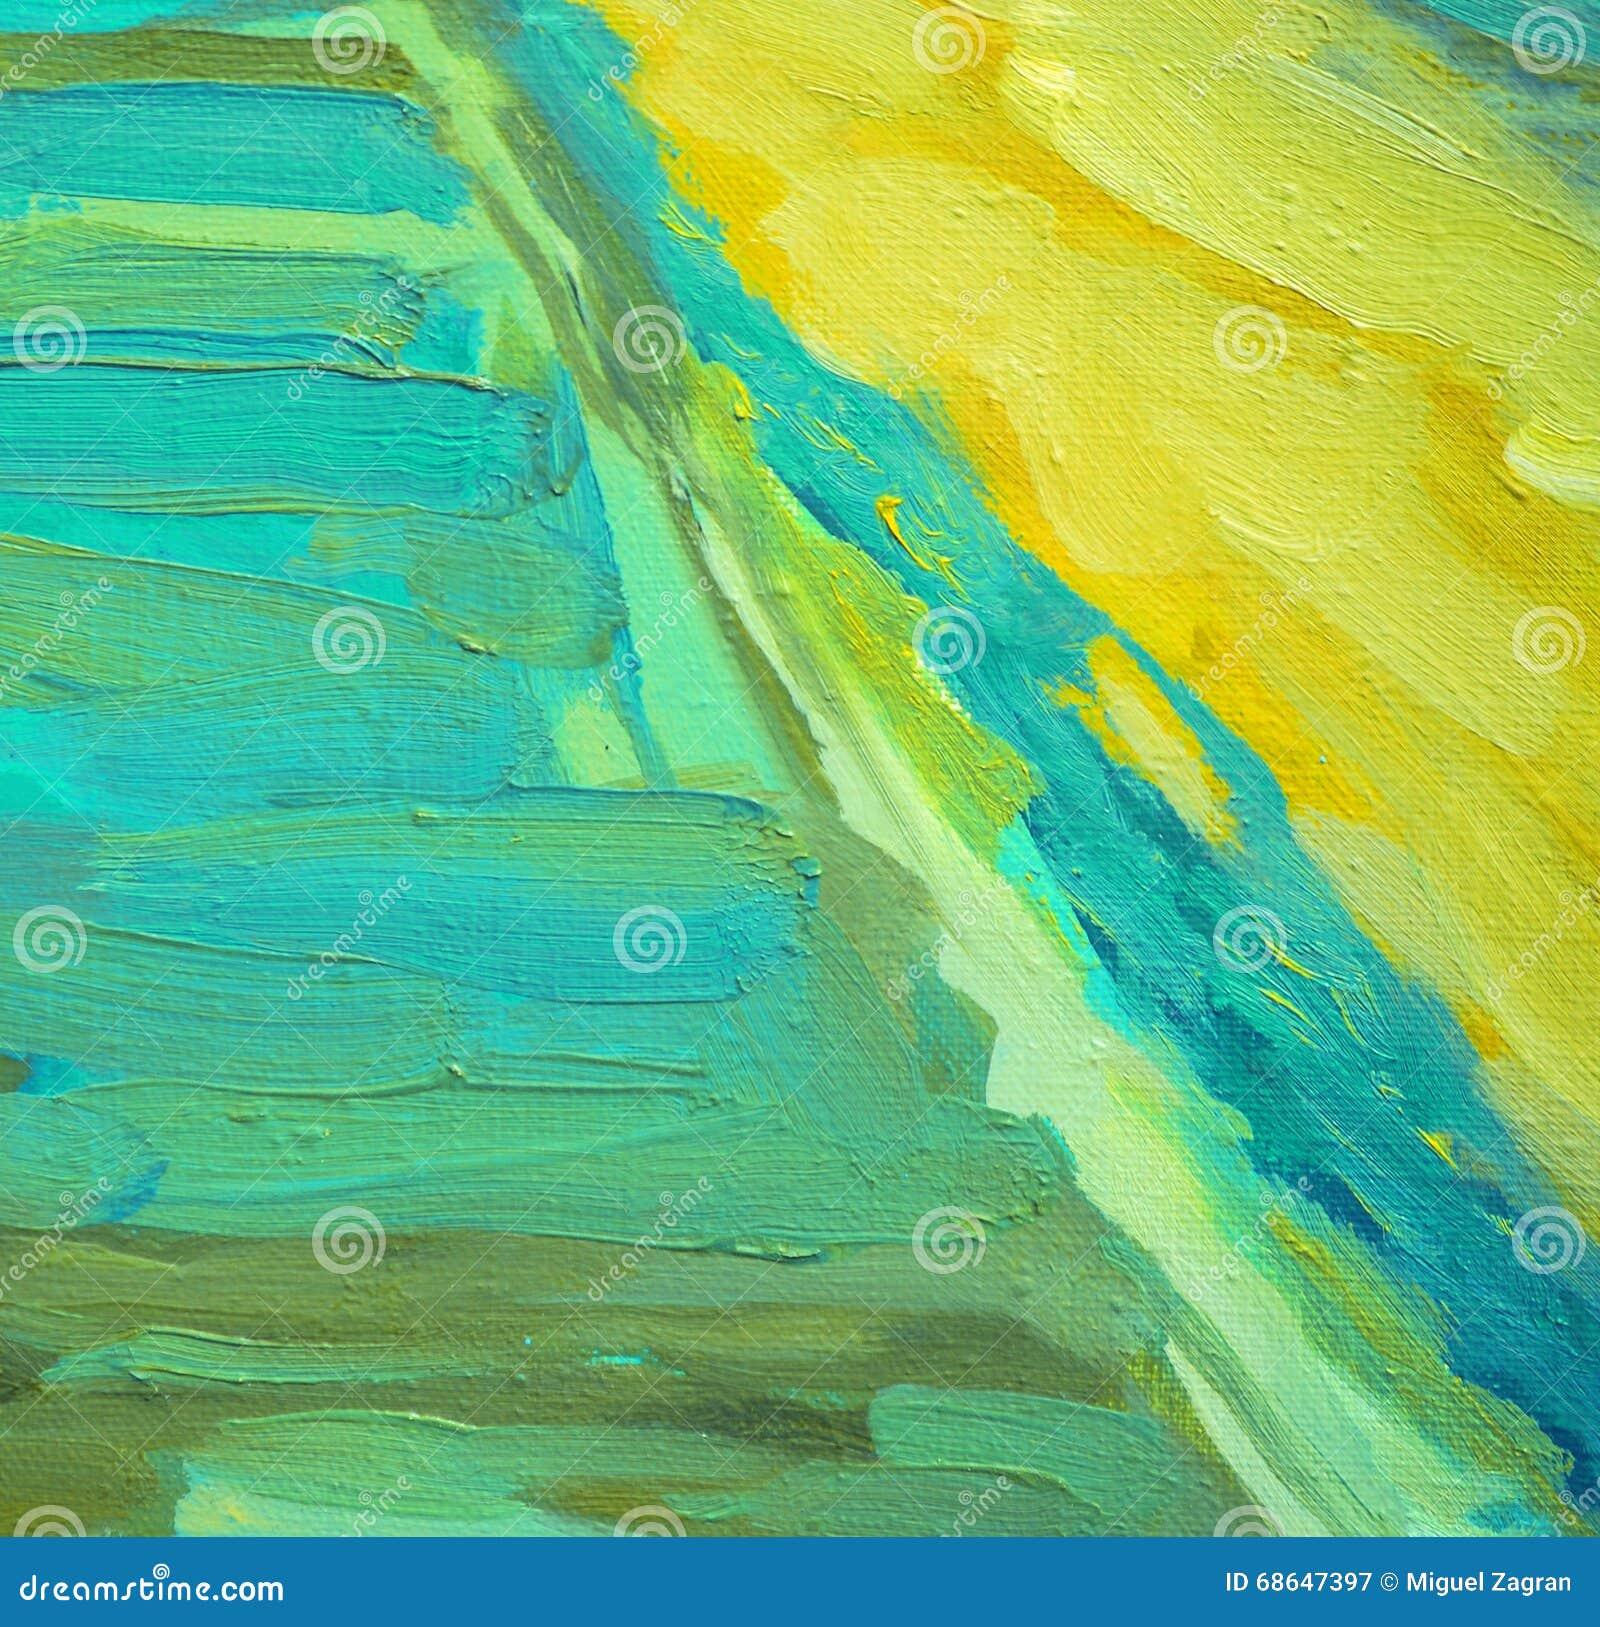 Pintura a óleo abstrata decorativa na lona, ilustração